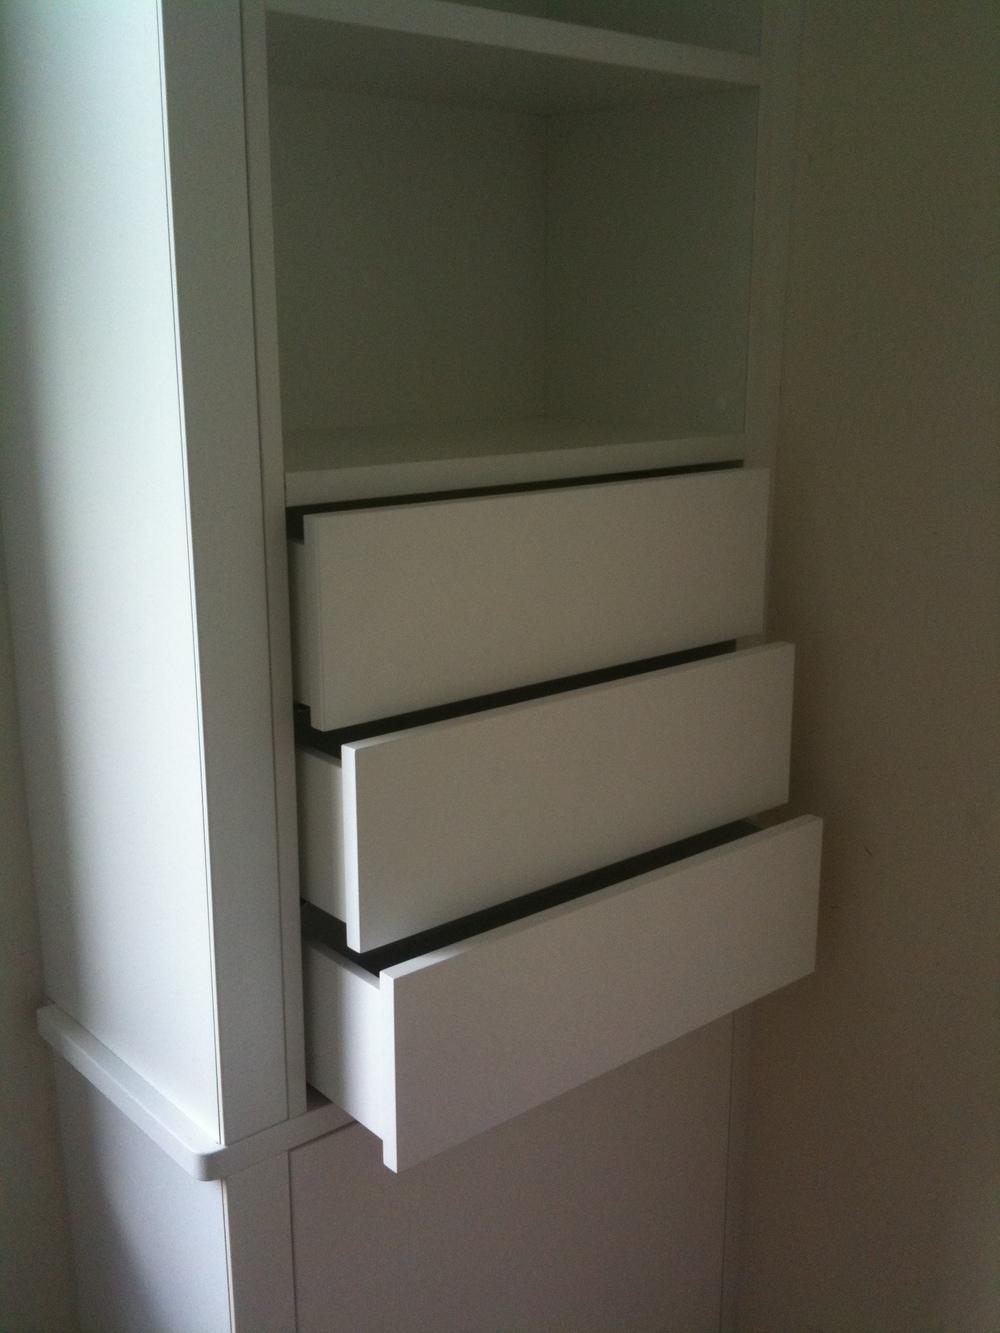 Study drawers